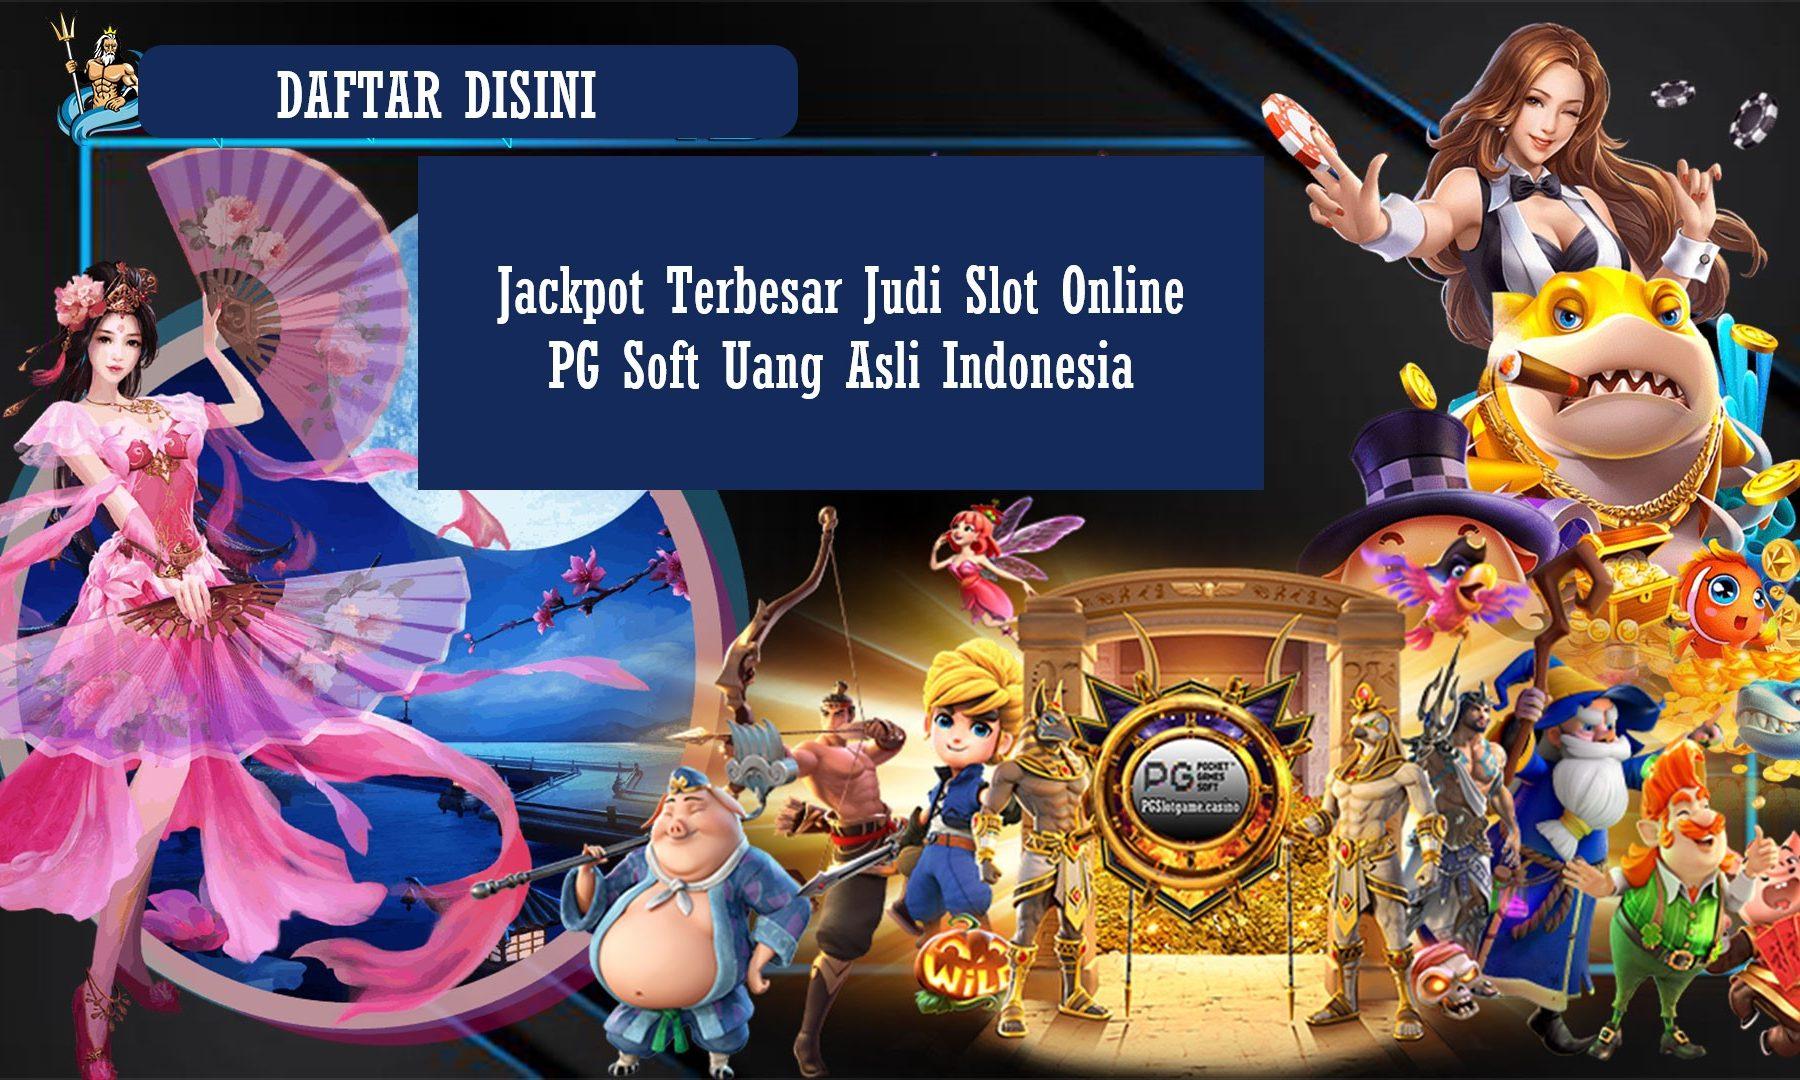 Jackpot Terbesar Judi Slot Online PG Soft Uang Asli Indonesia